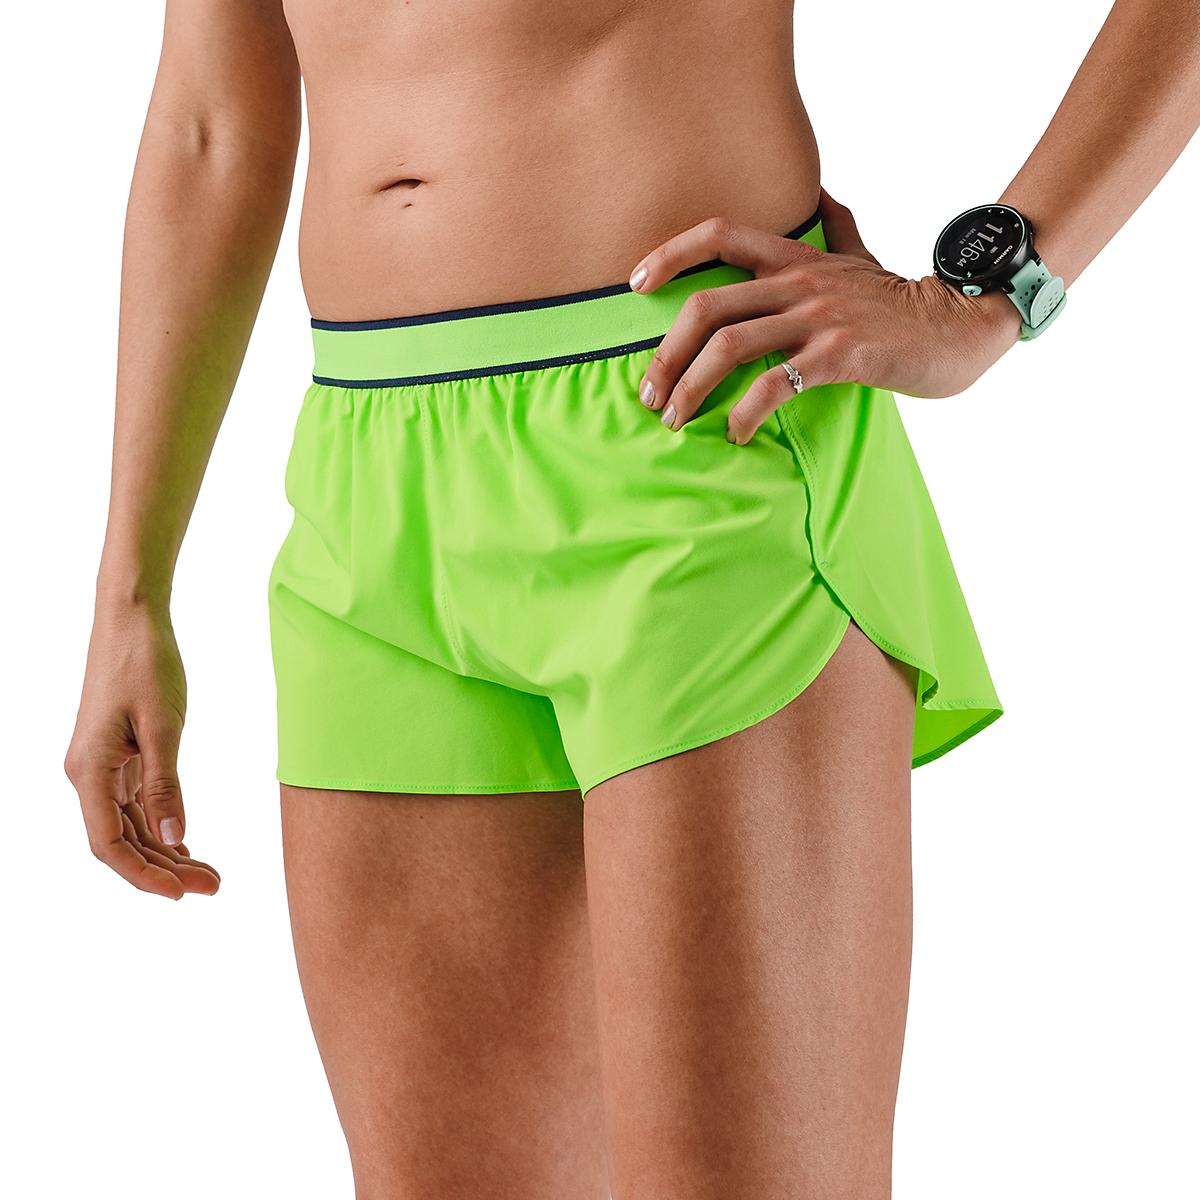 "Women's Rabbit Winner 2.0 2"" Running Shorts, , large, image 4"